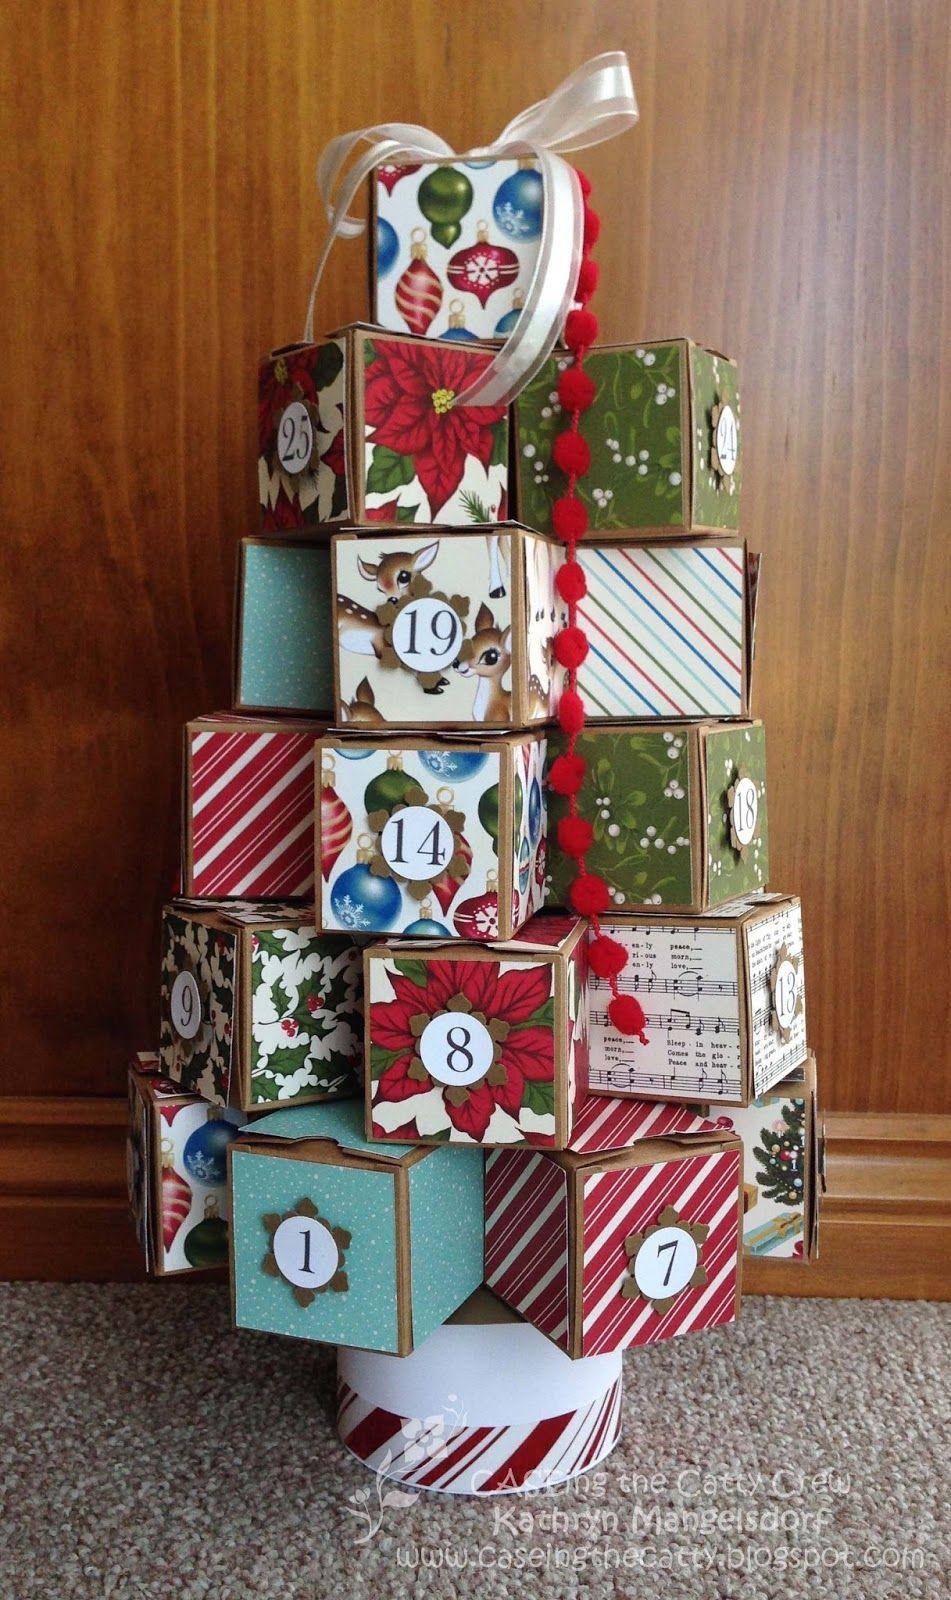 Calendrier De L'avent My Little Box : calendrier, l'avent, little, Hosted, Class, Sunday, Attendees, Christmas, Advent, Calendar, In…, Calendrier, L'avant,, Avent,, Dessin, Fête